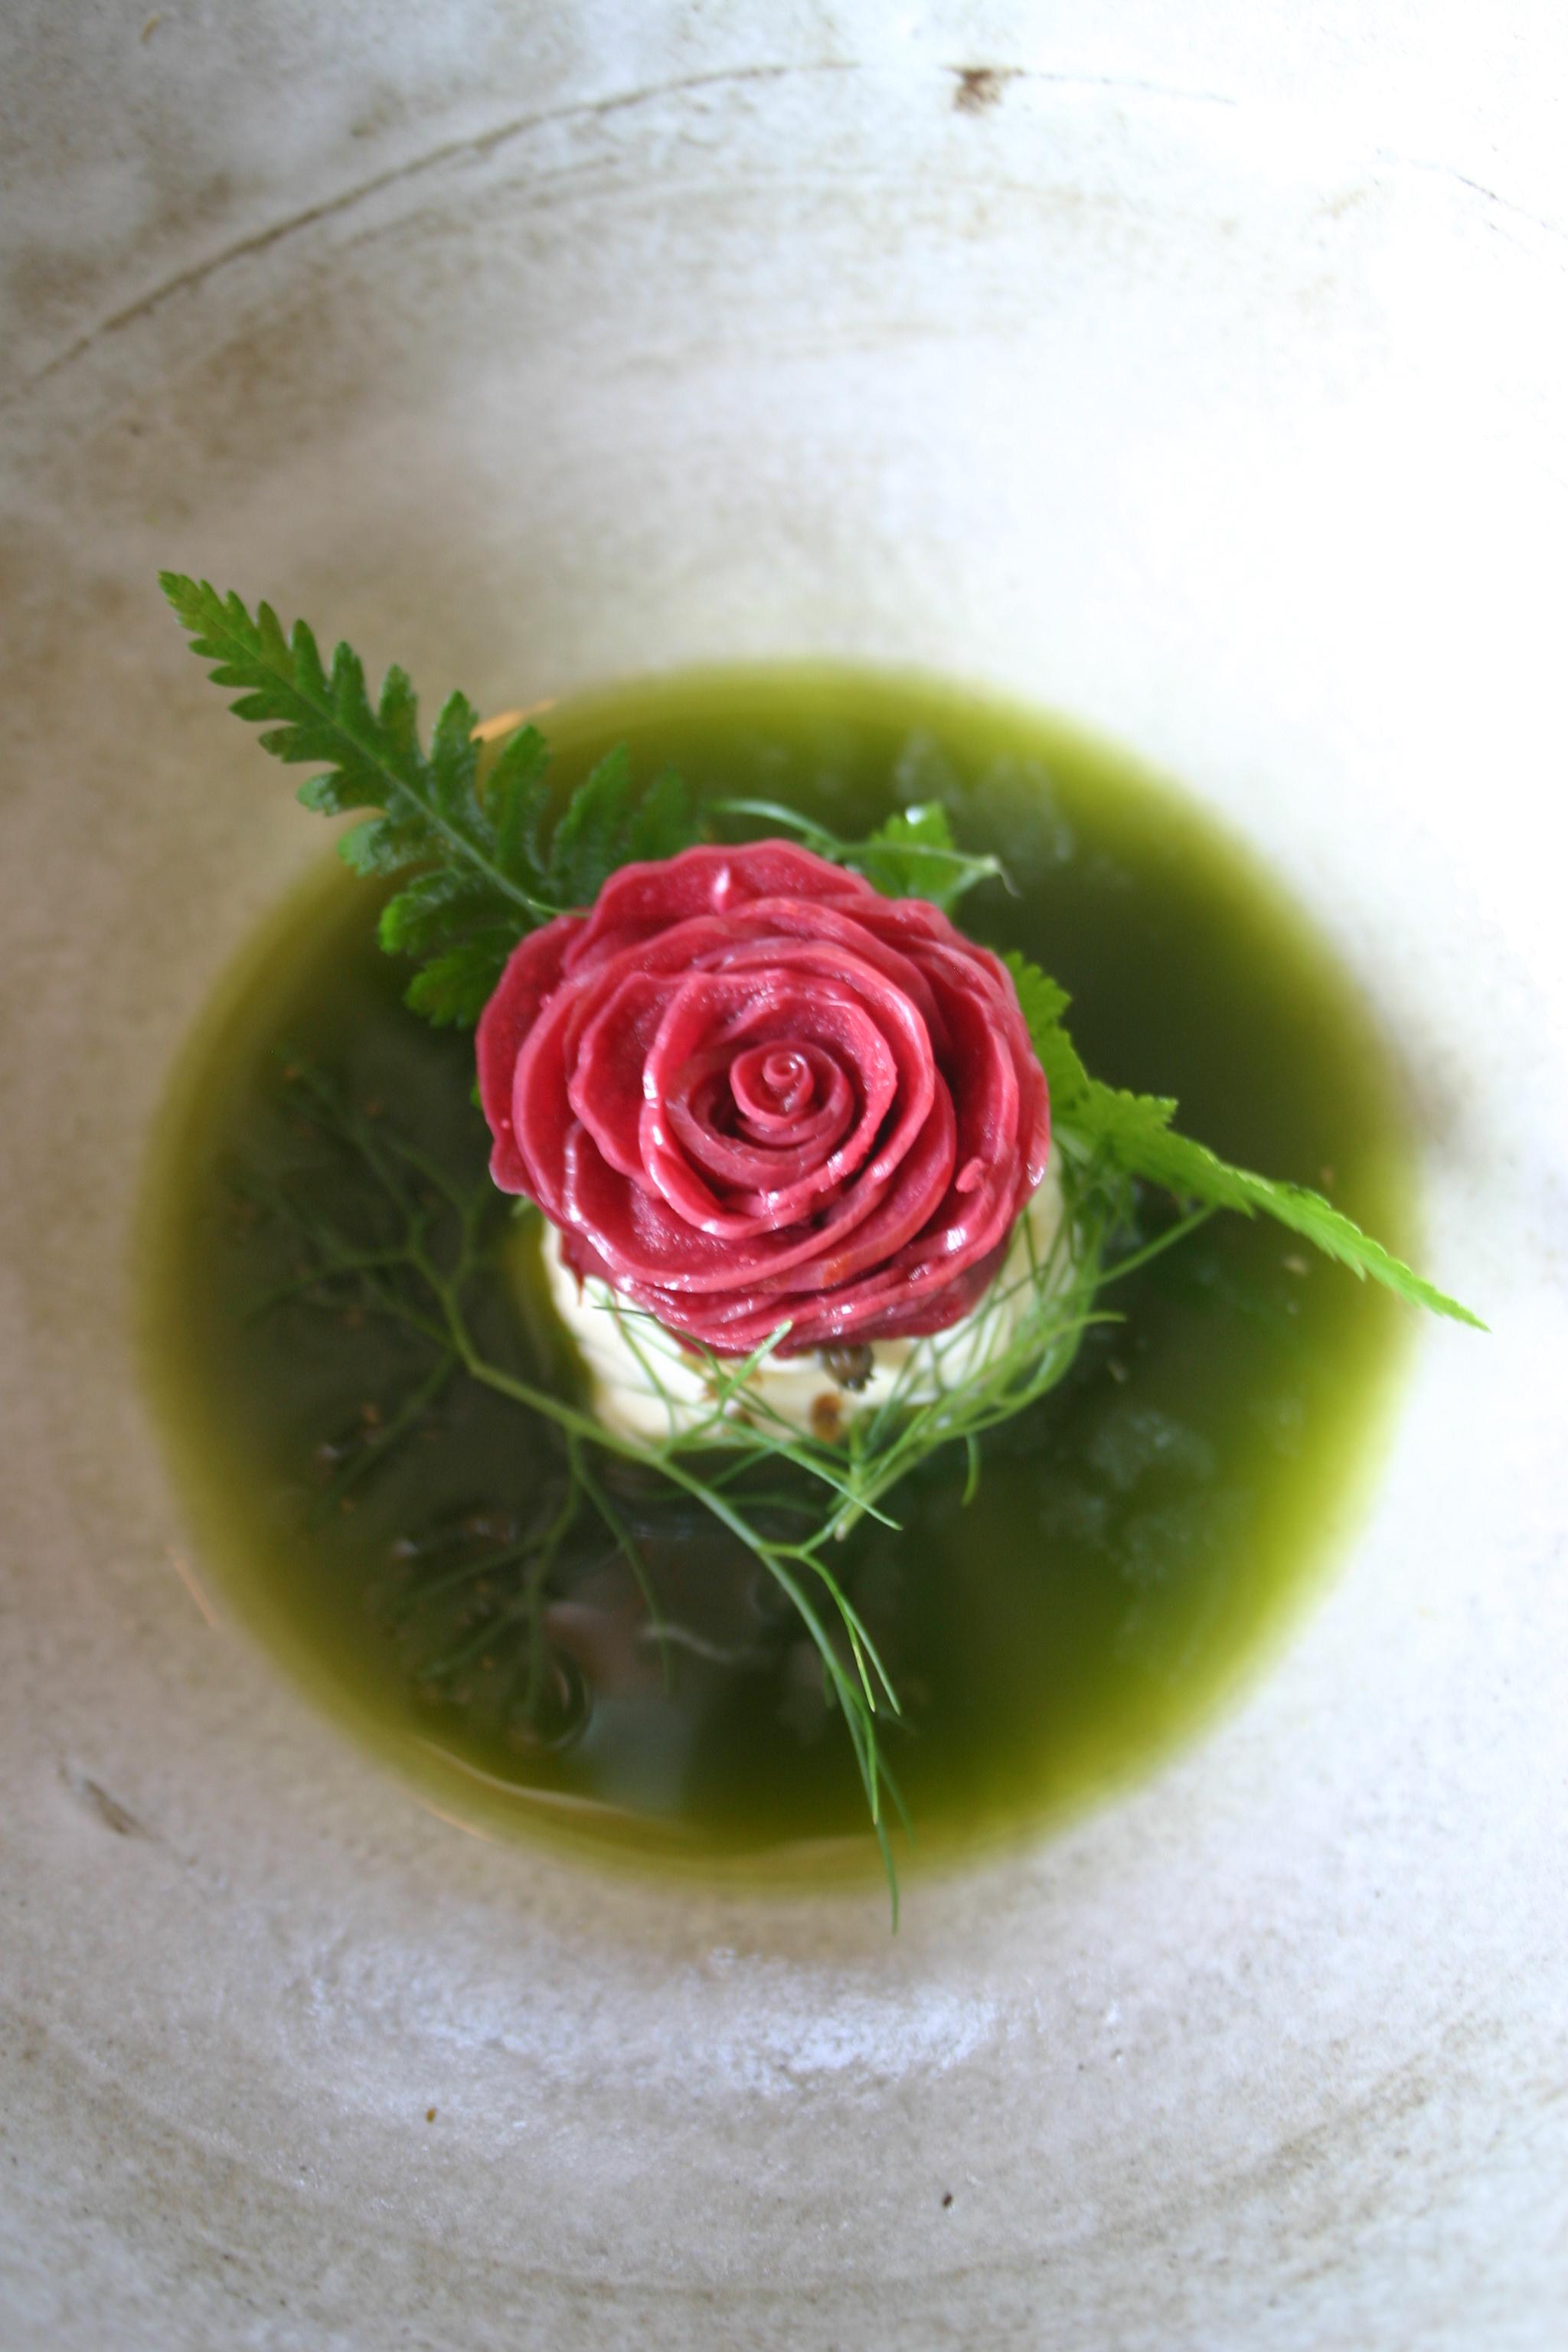 Rhubarb, ardıçlı taze krema, İspanyol maydanozu ve kuzukulağı sosu